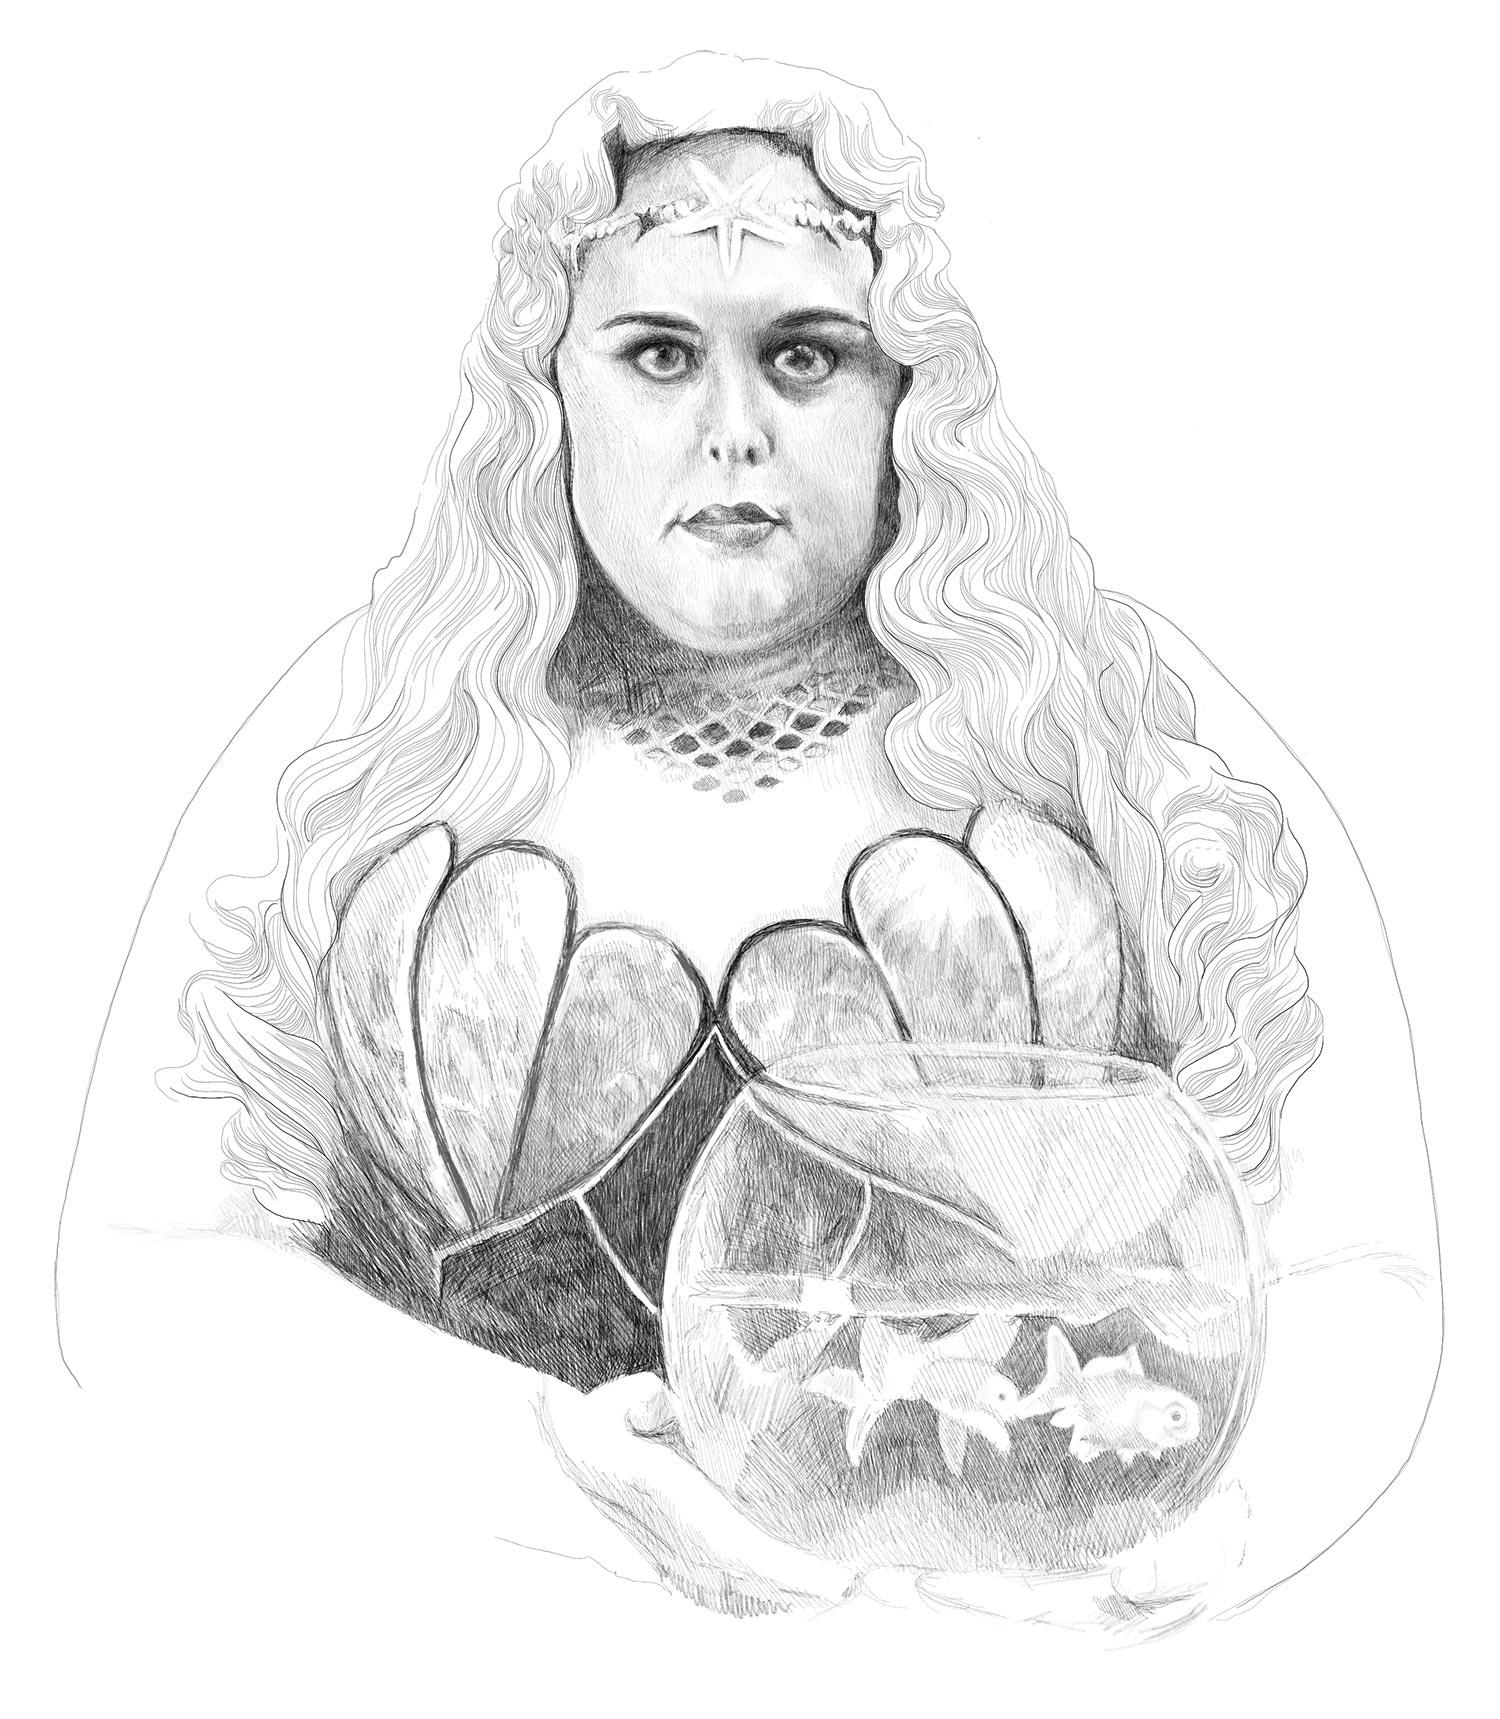 I've redrawn the wonderful portrait of Miss Atlantis, by Leah Gallo